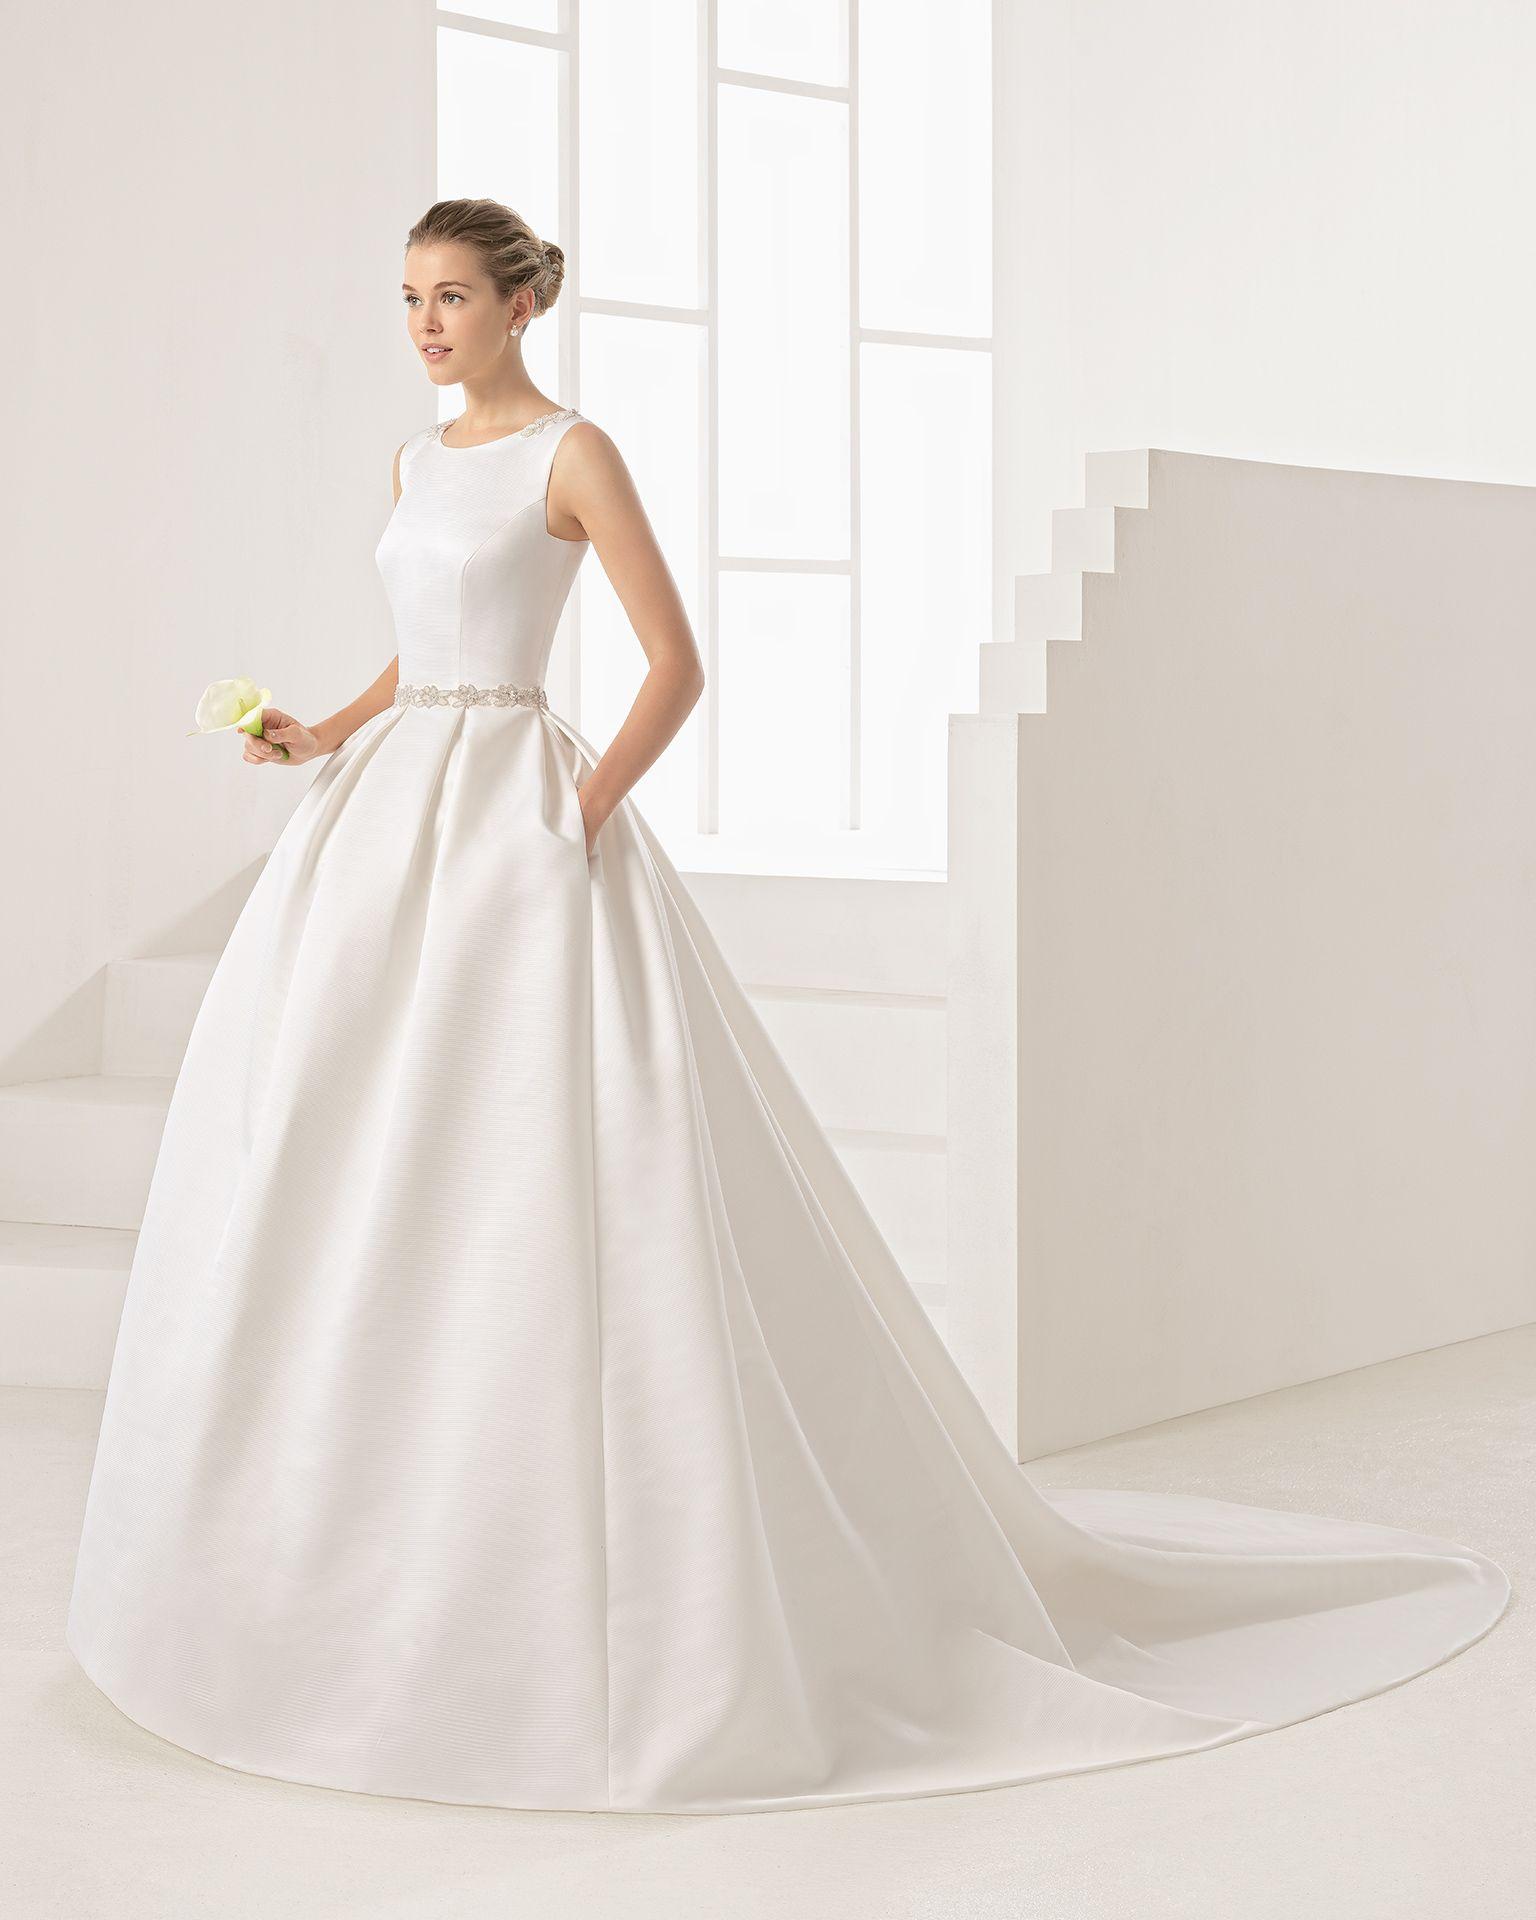 ORBE - 2017 Bridal Collection. Rosa Clará Two.   Hochzeitskleider